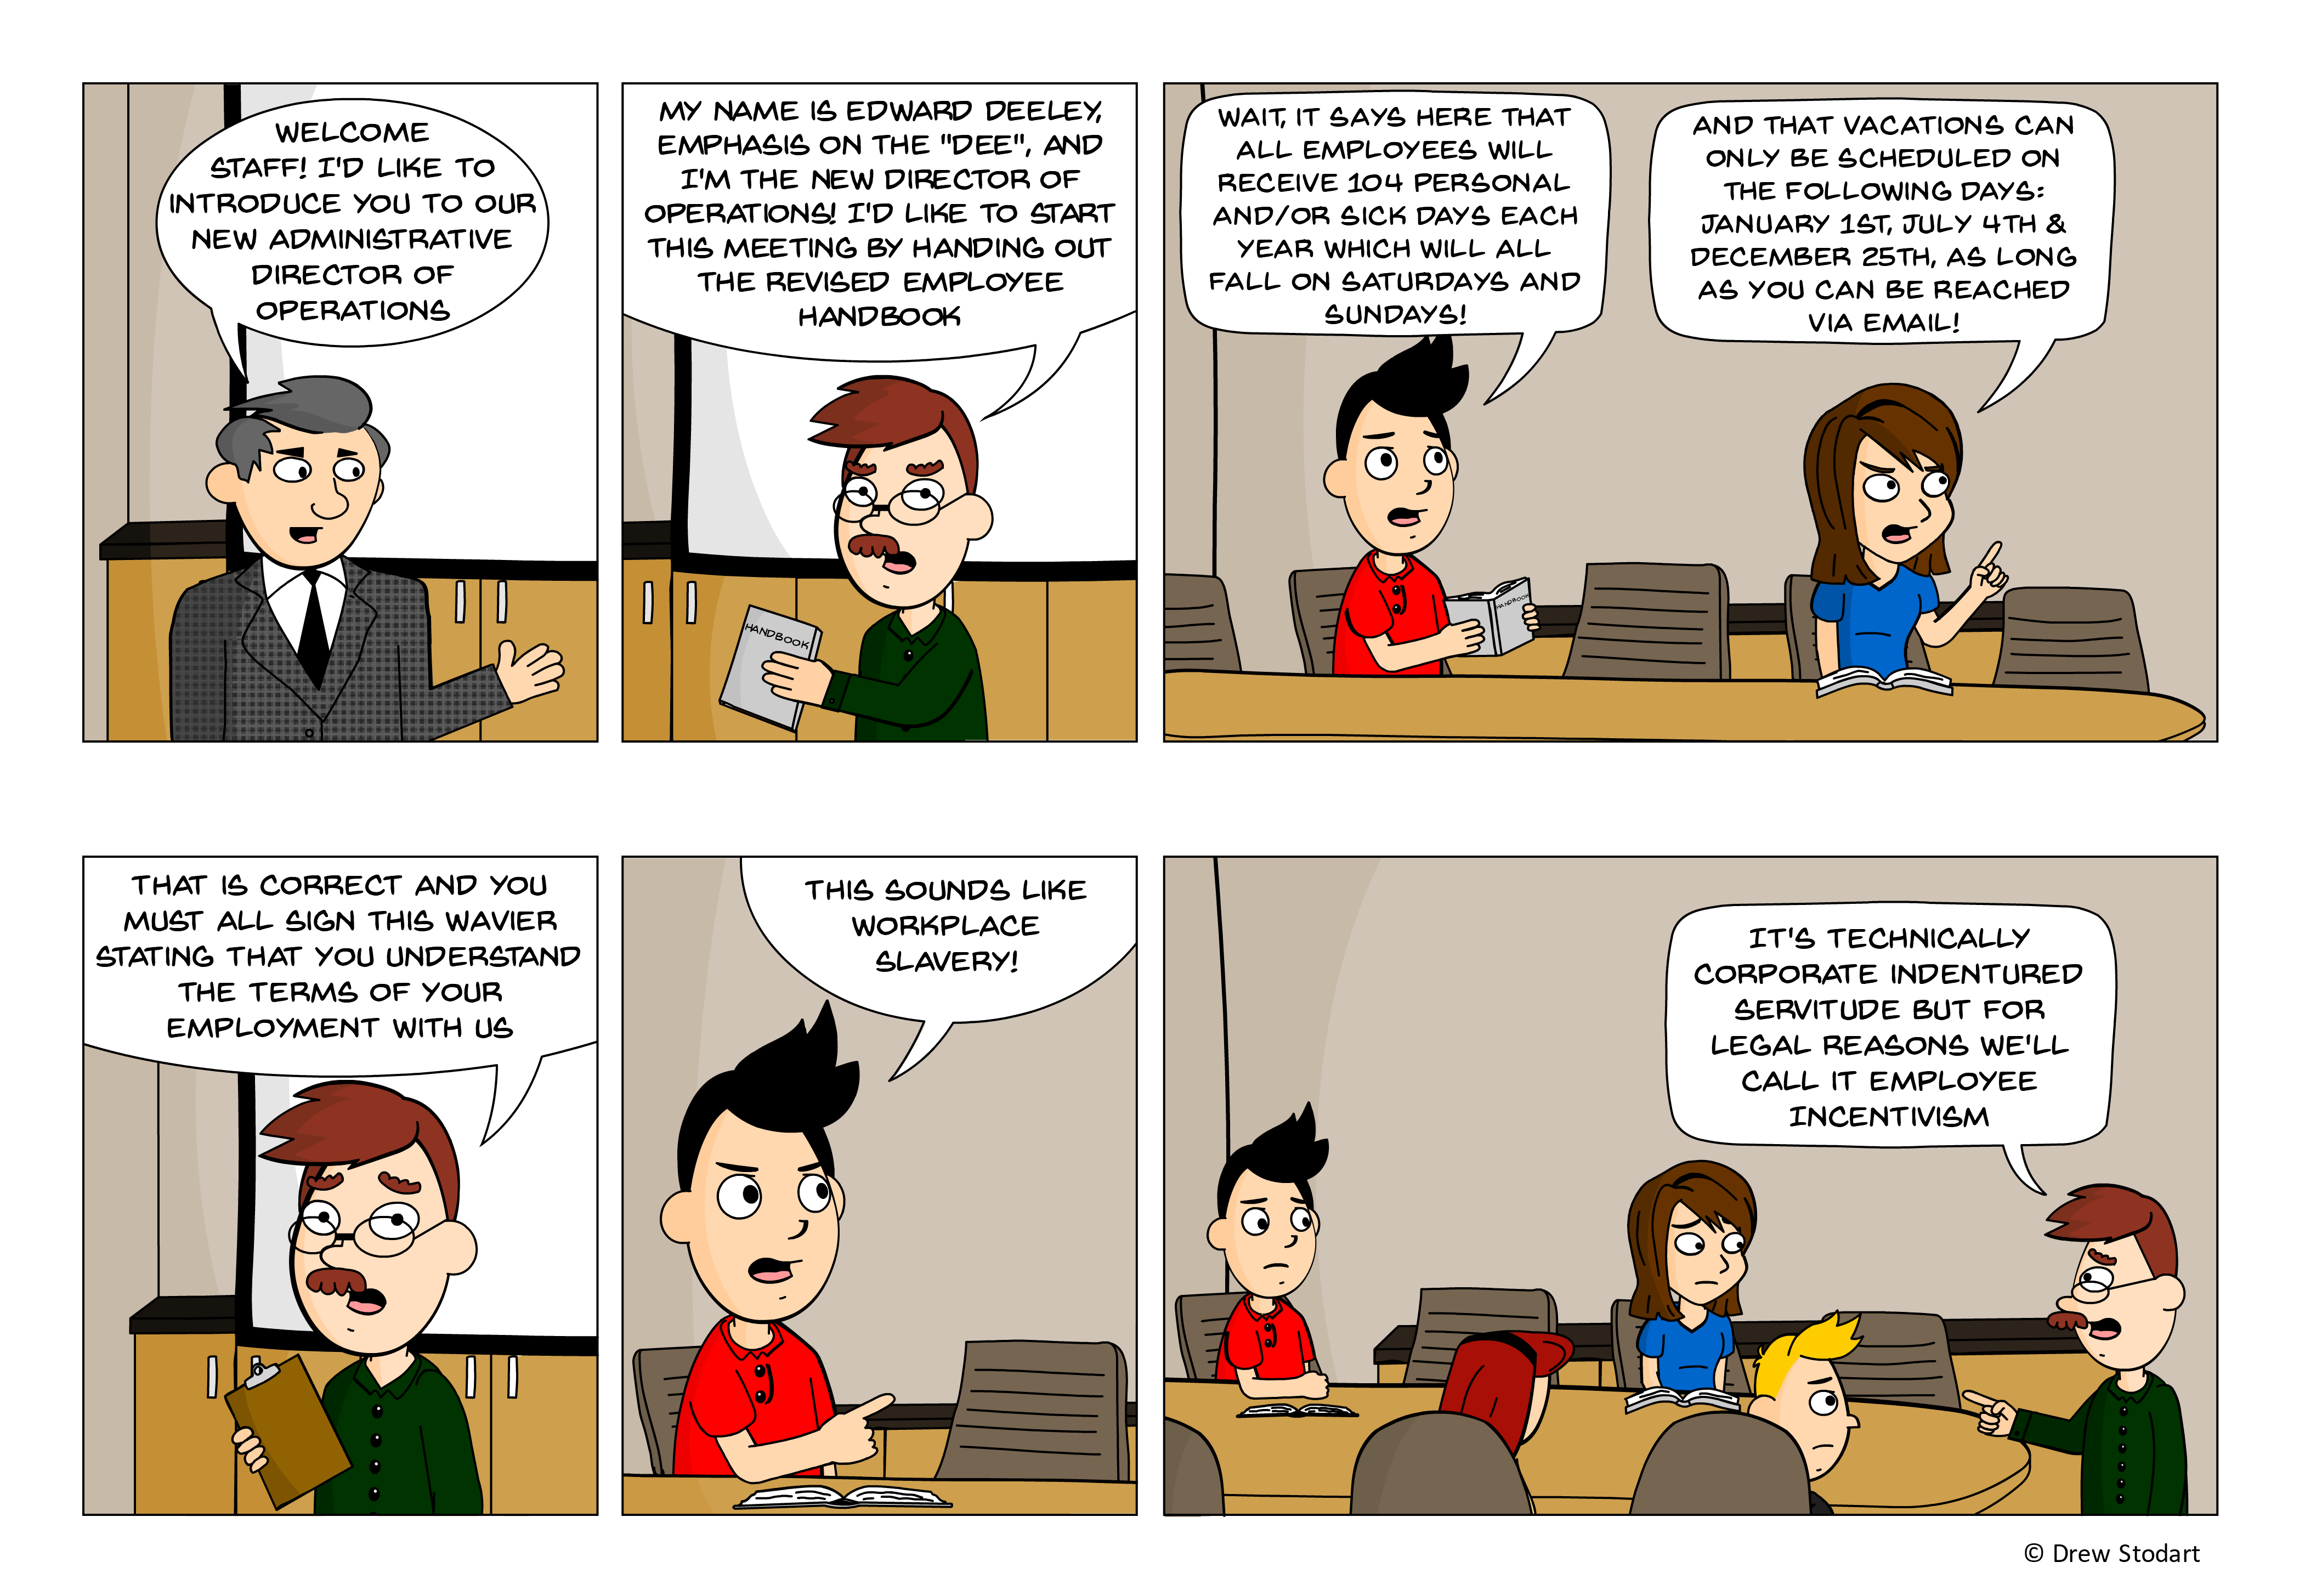 Average Joe 59 – Employee Incentivism